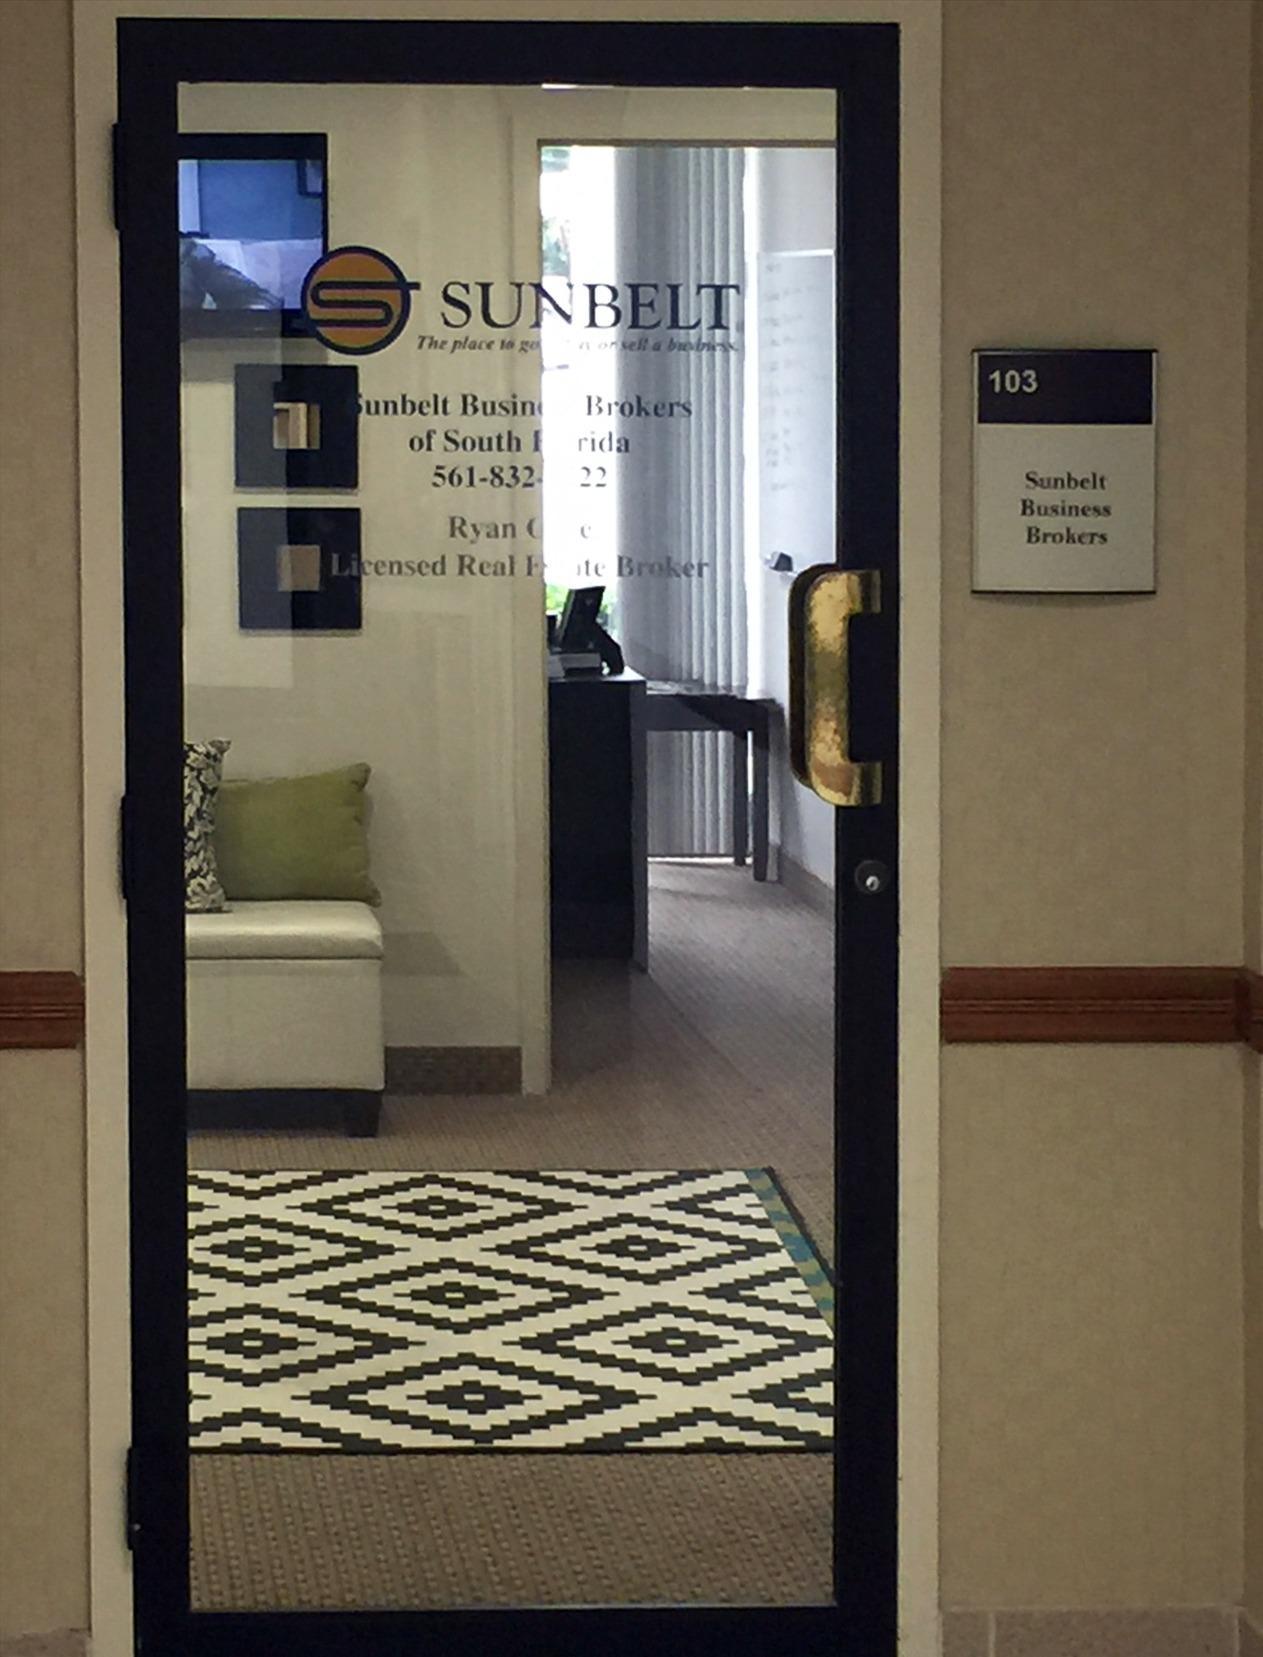 Sunbelt Business Brokers of South Florida image 0